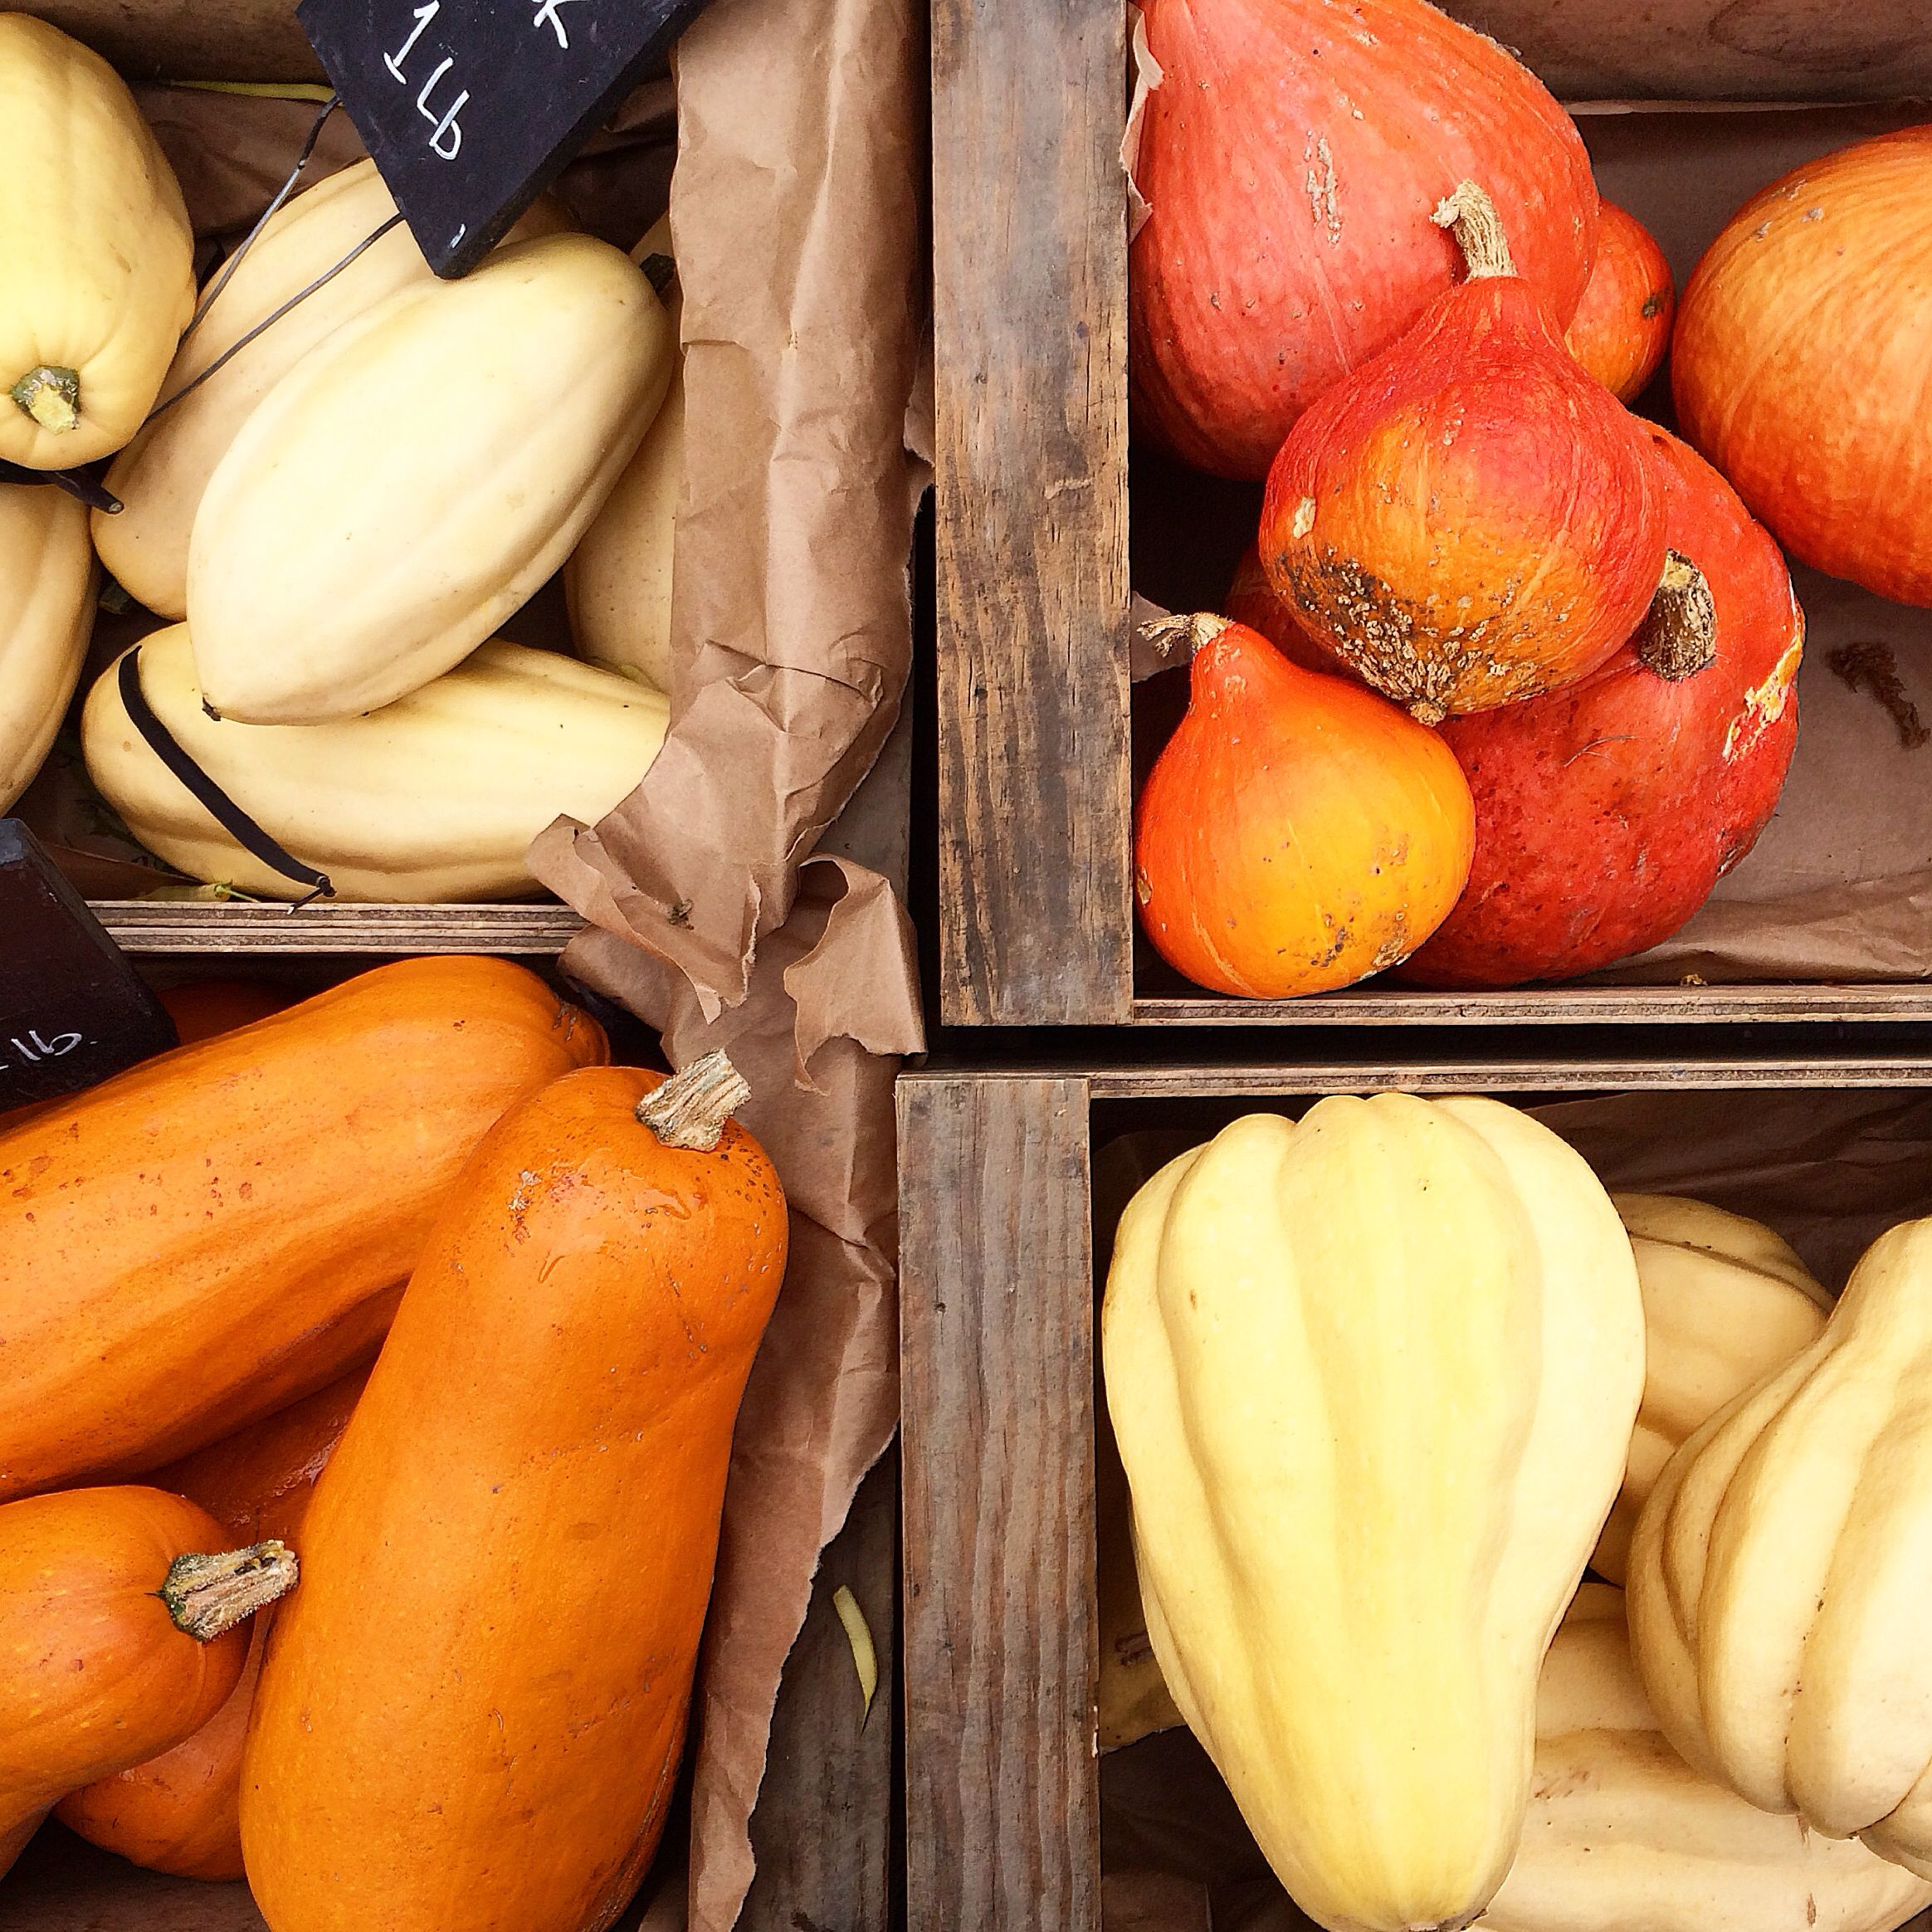 Assortment of squashes from La Tercera Farm at the Berkeley Farmers Market